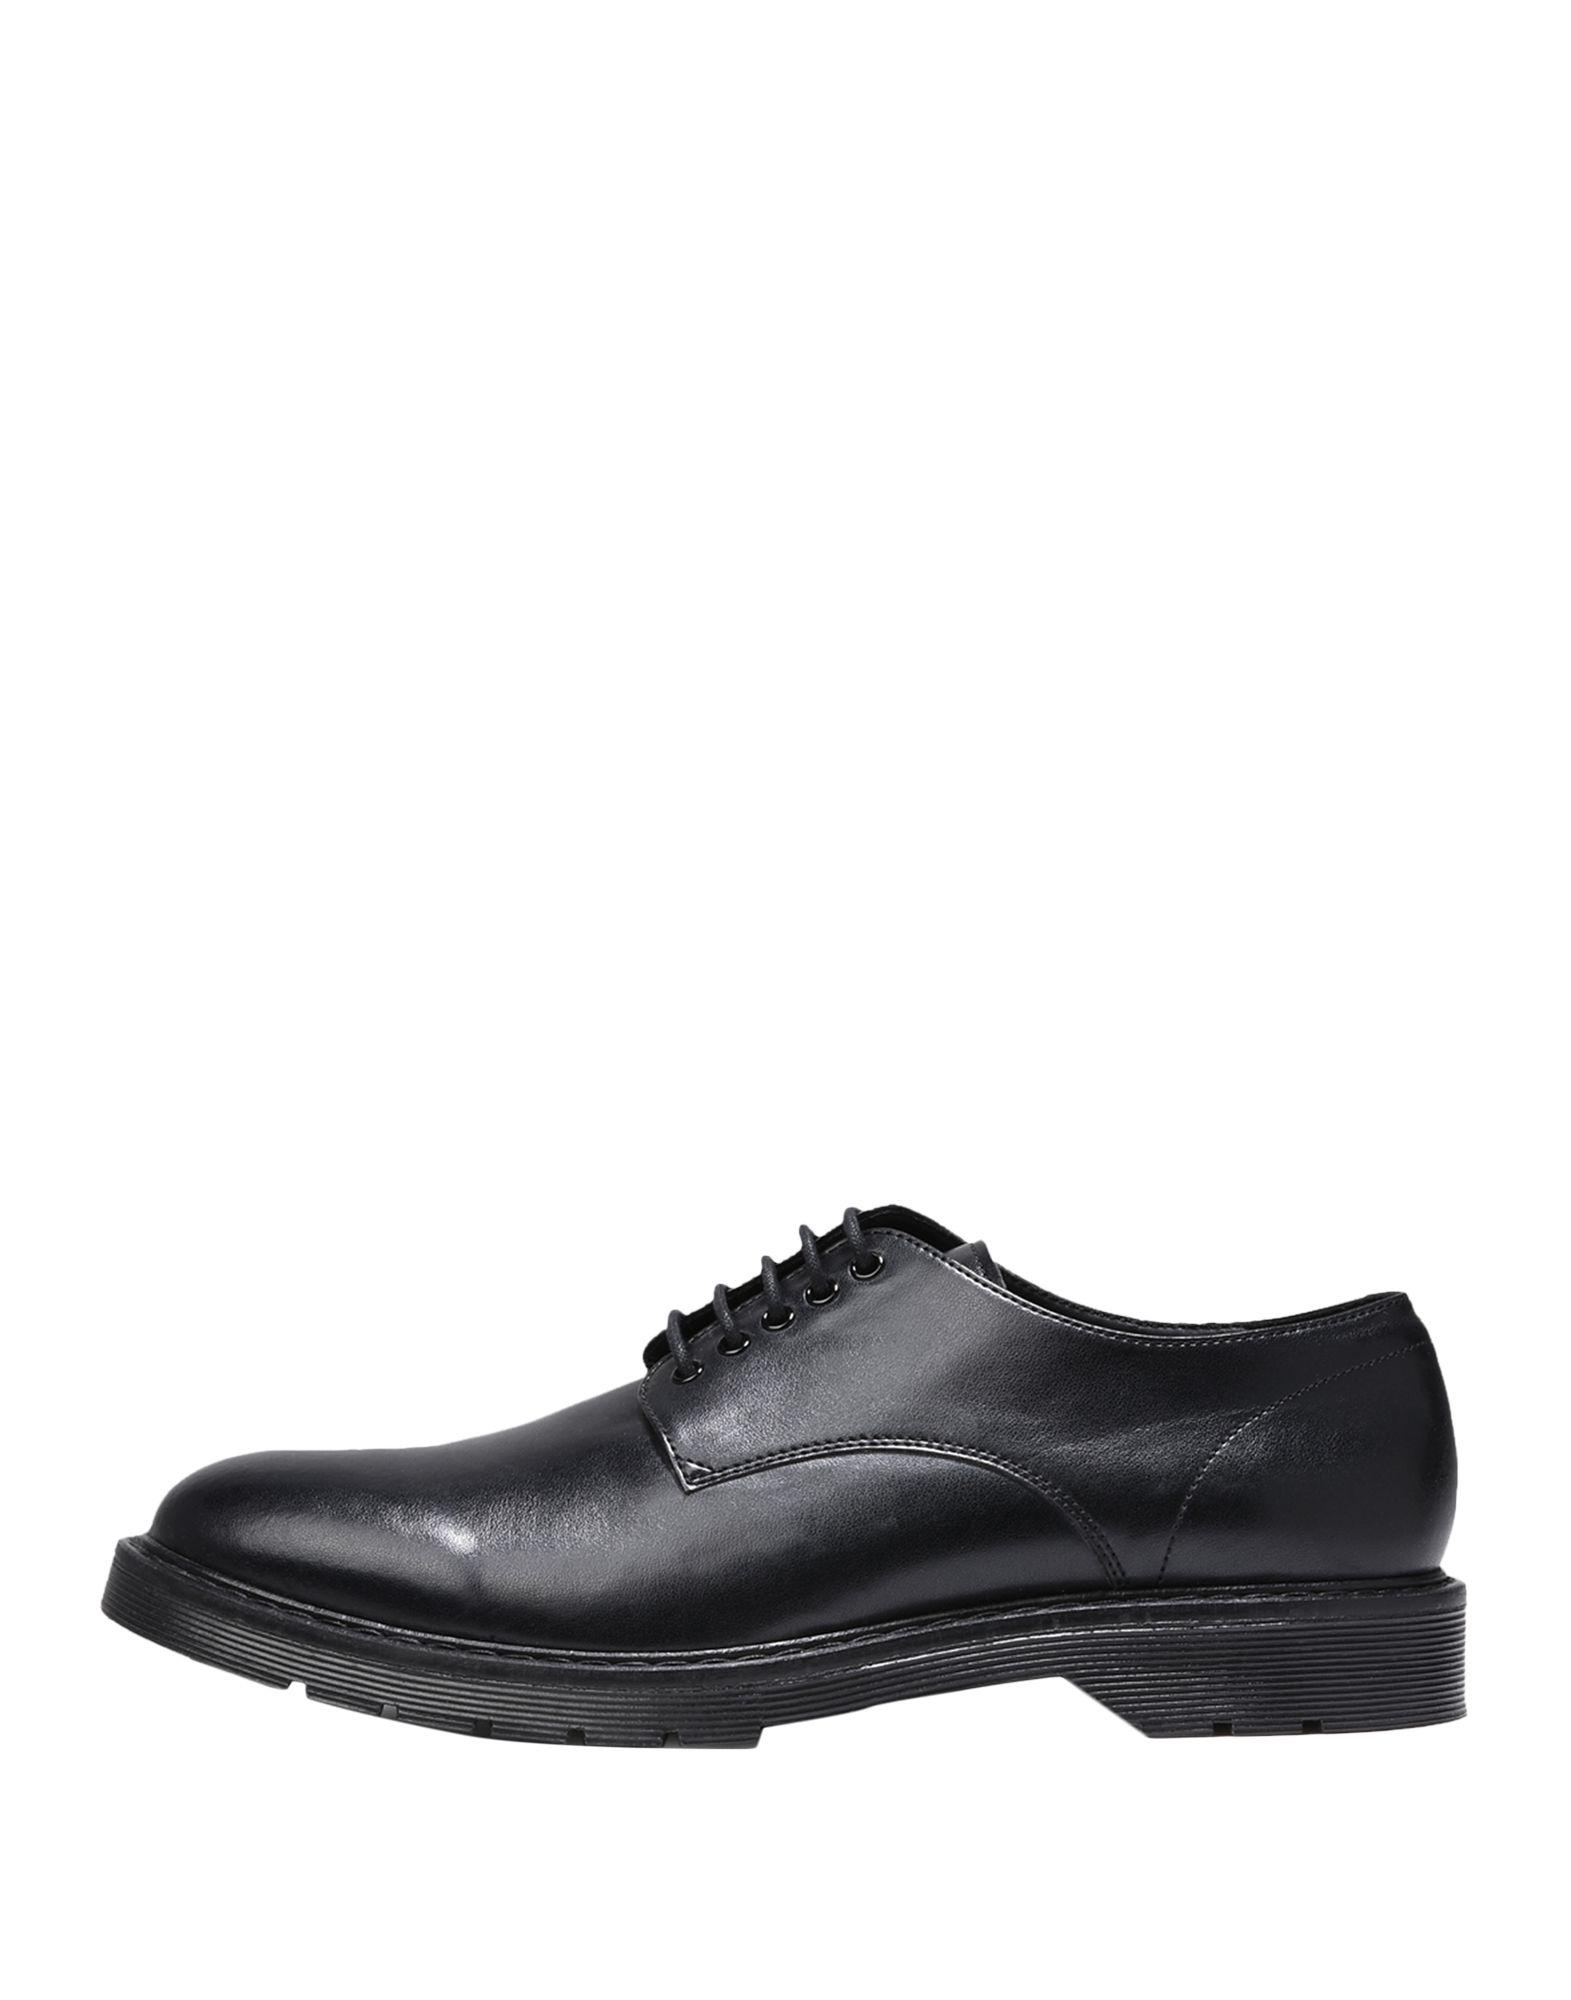 ARMANI EXCHANGE Обувь на шнурках